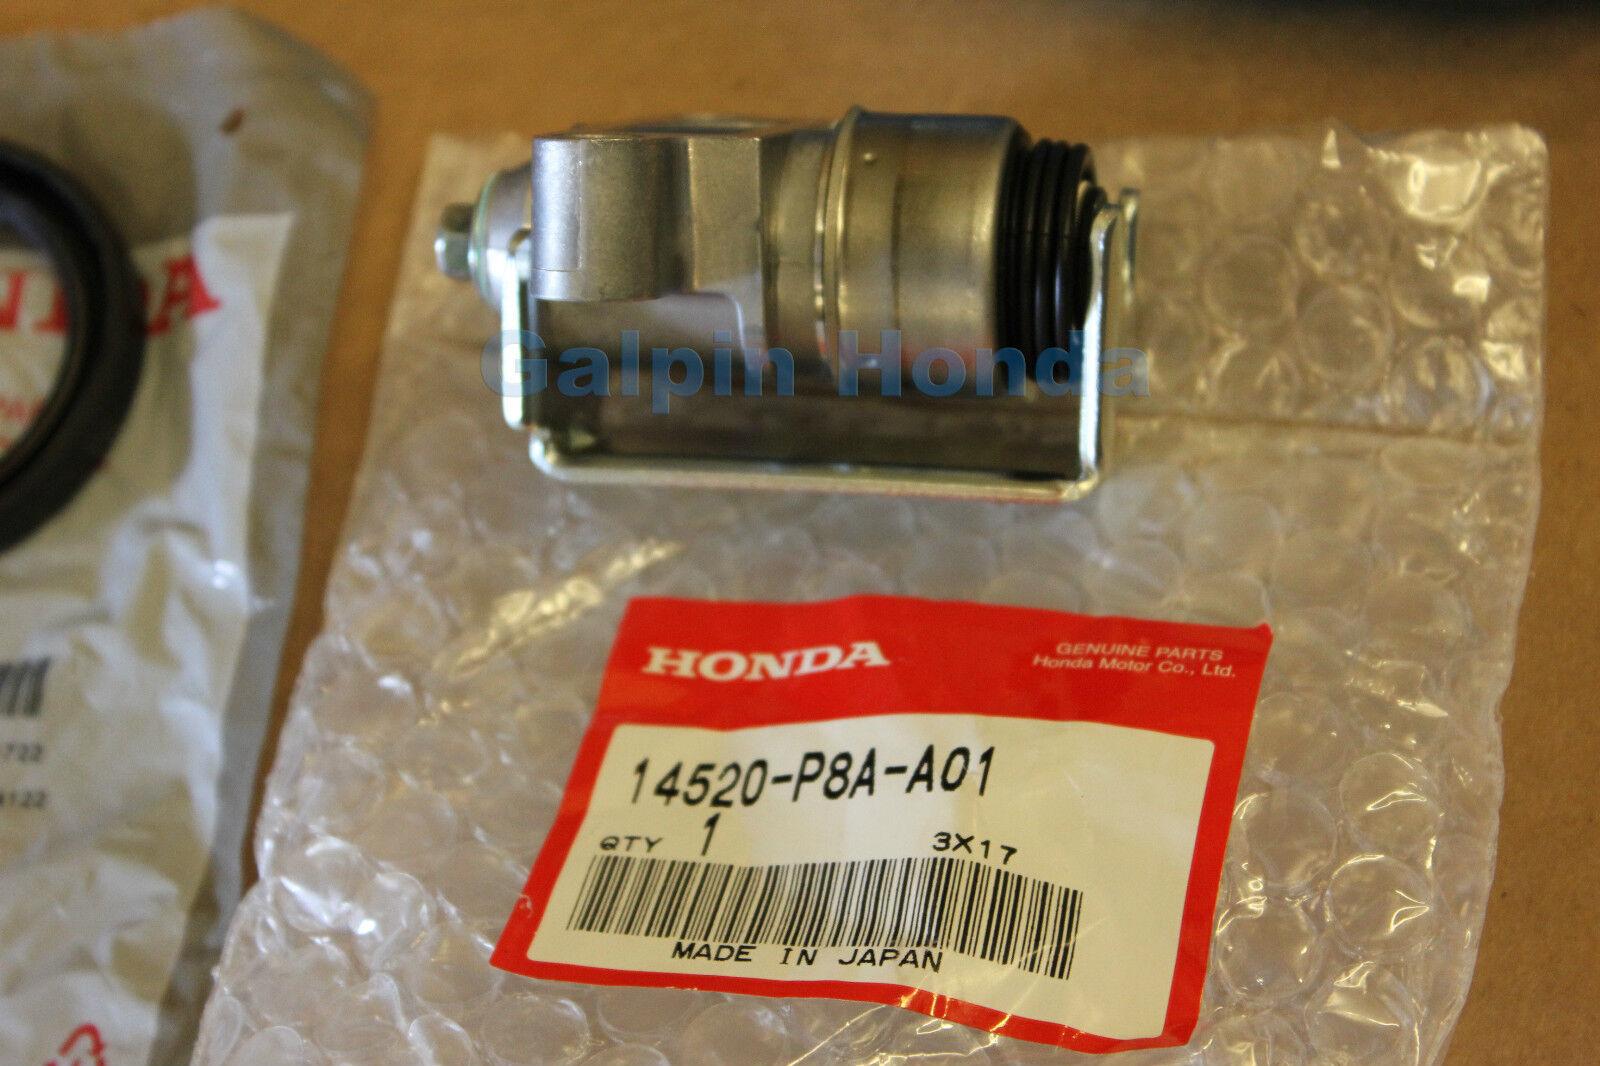 Genuine Oem Acura Cl Tl Honda V6 Timing Belt Water Pump Kit With 2002 4 Of 7 Drive Belts